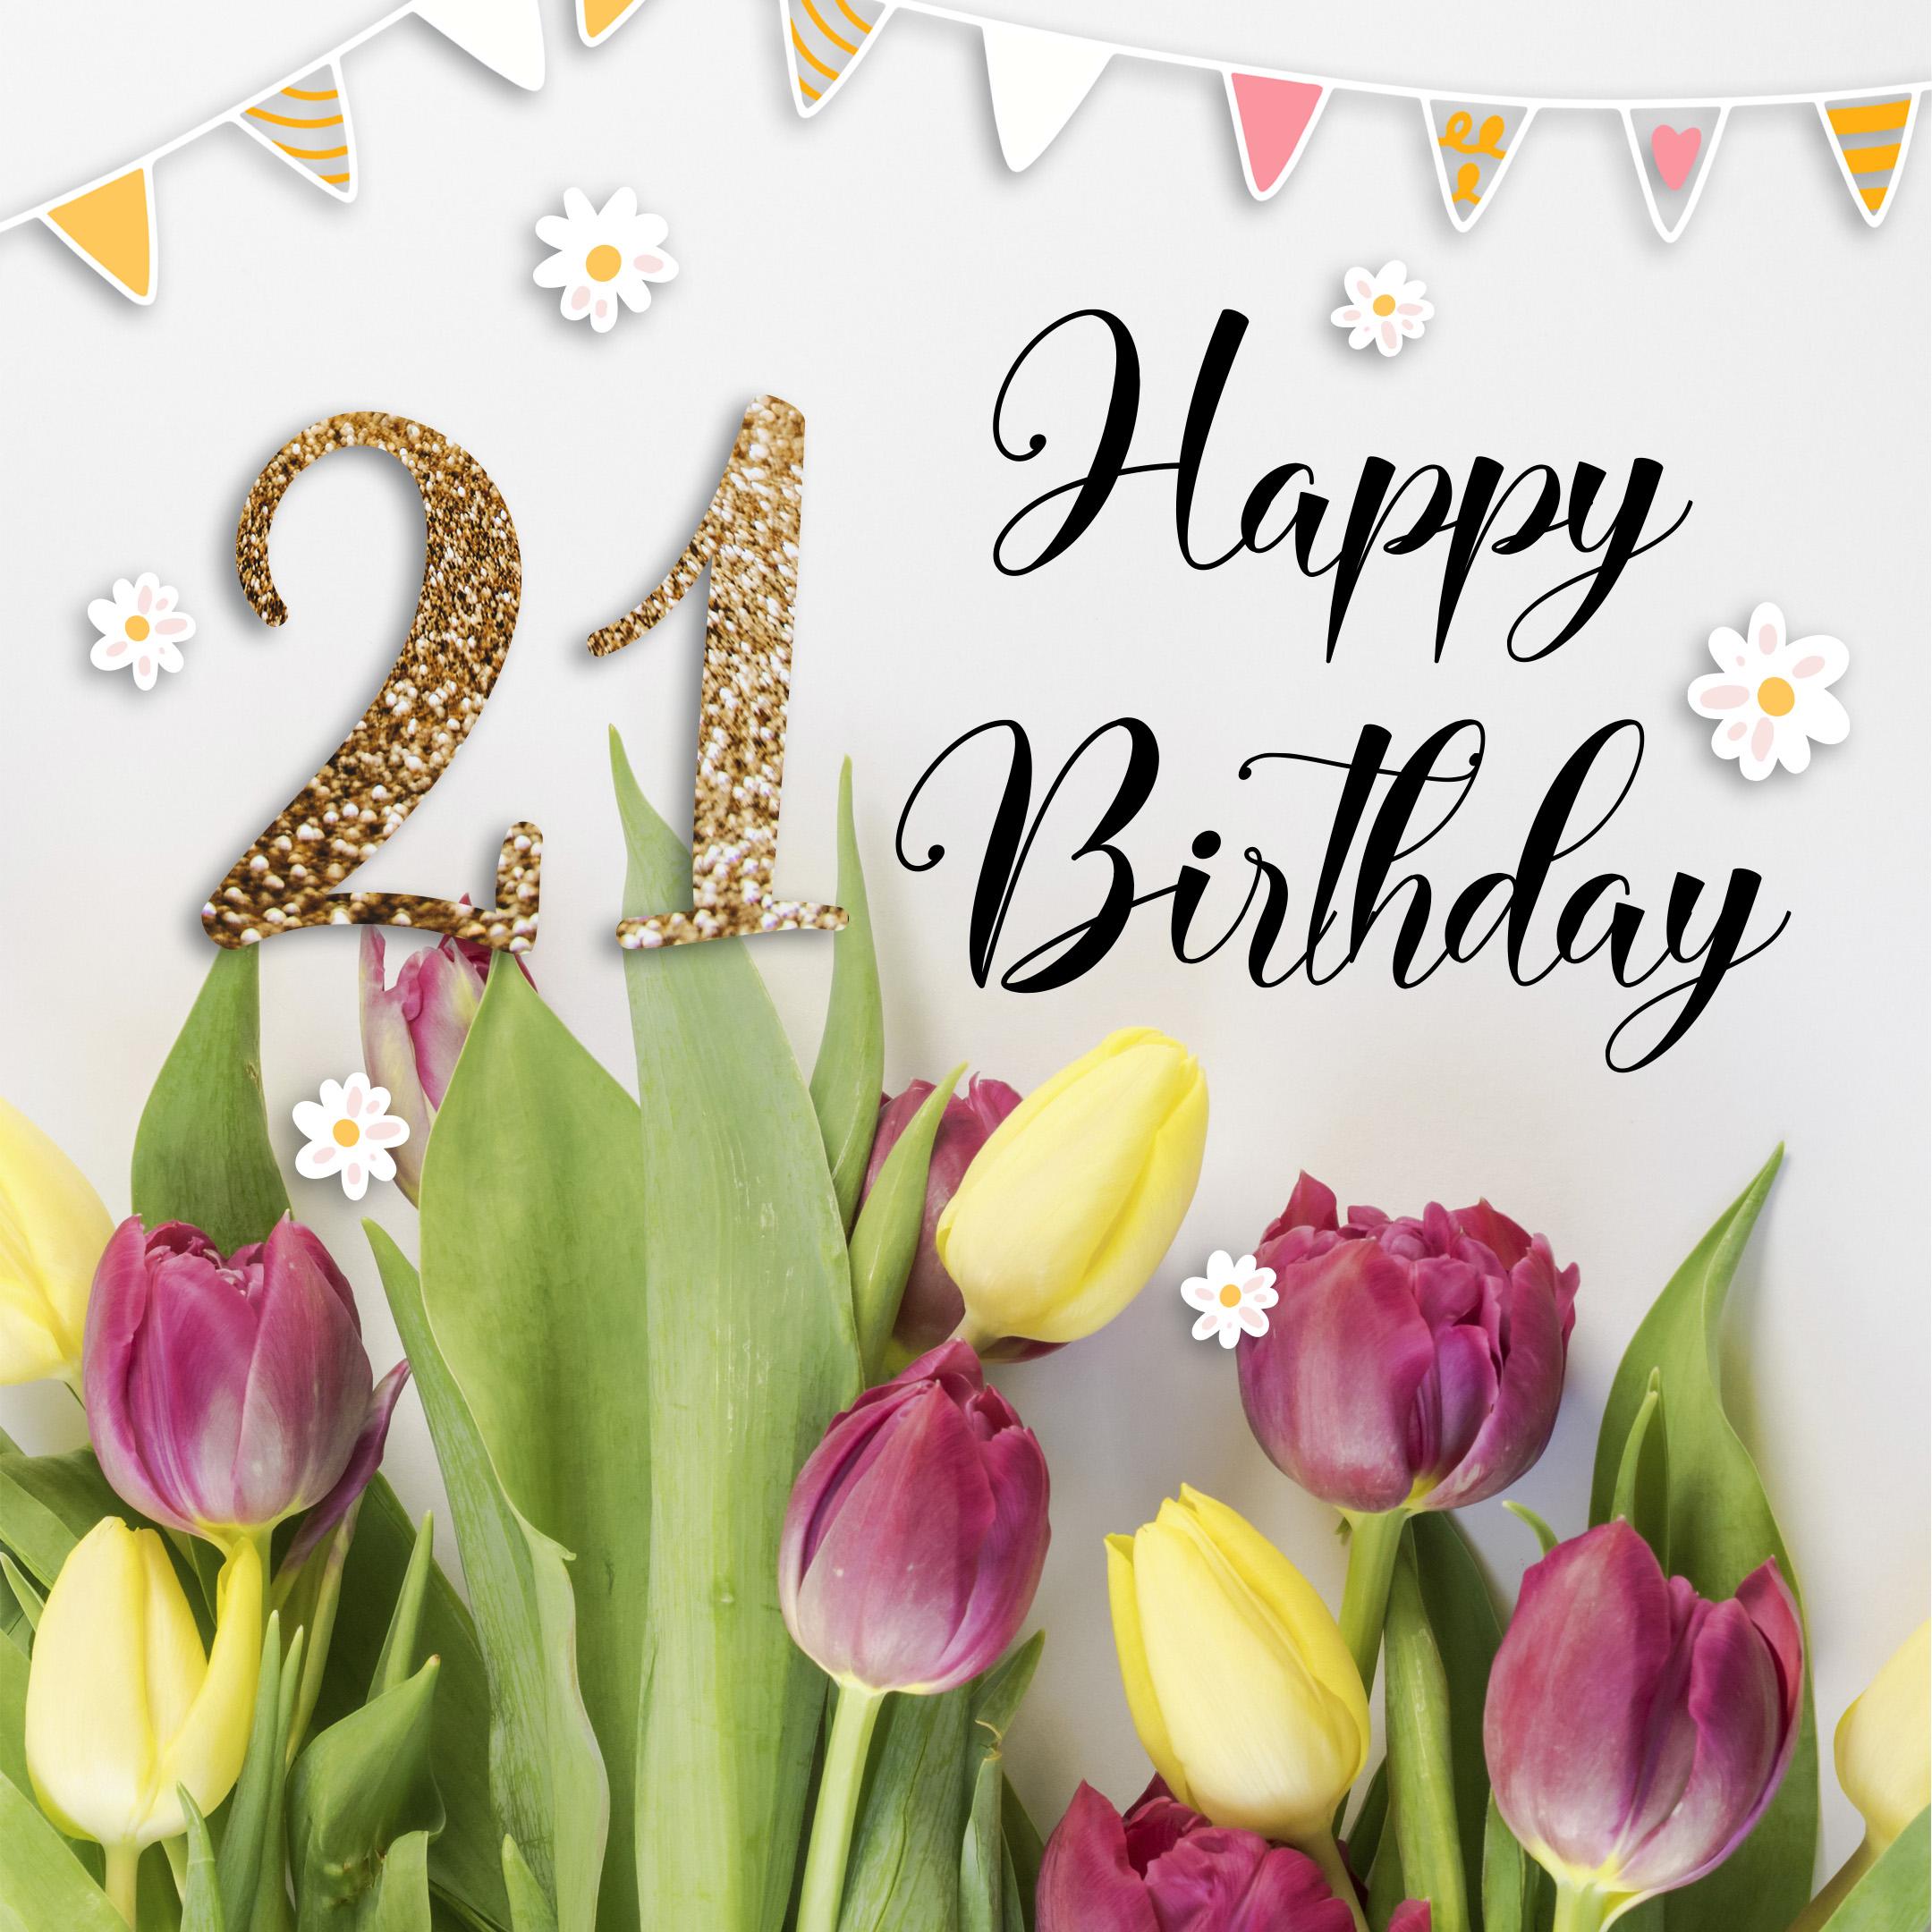 Free 21th Years Happy Birthday Image With Flowers - birthdayimg.com